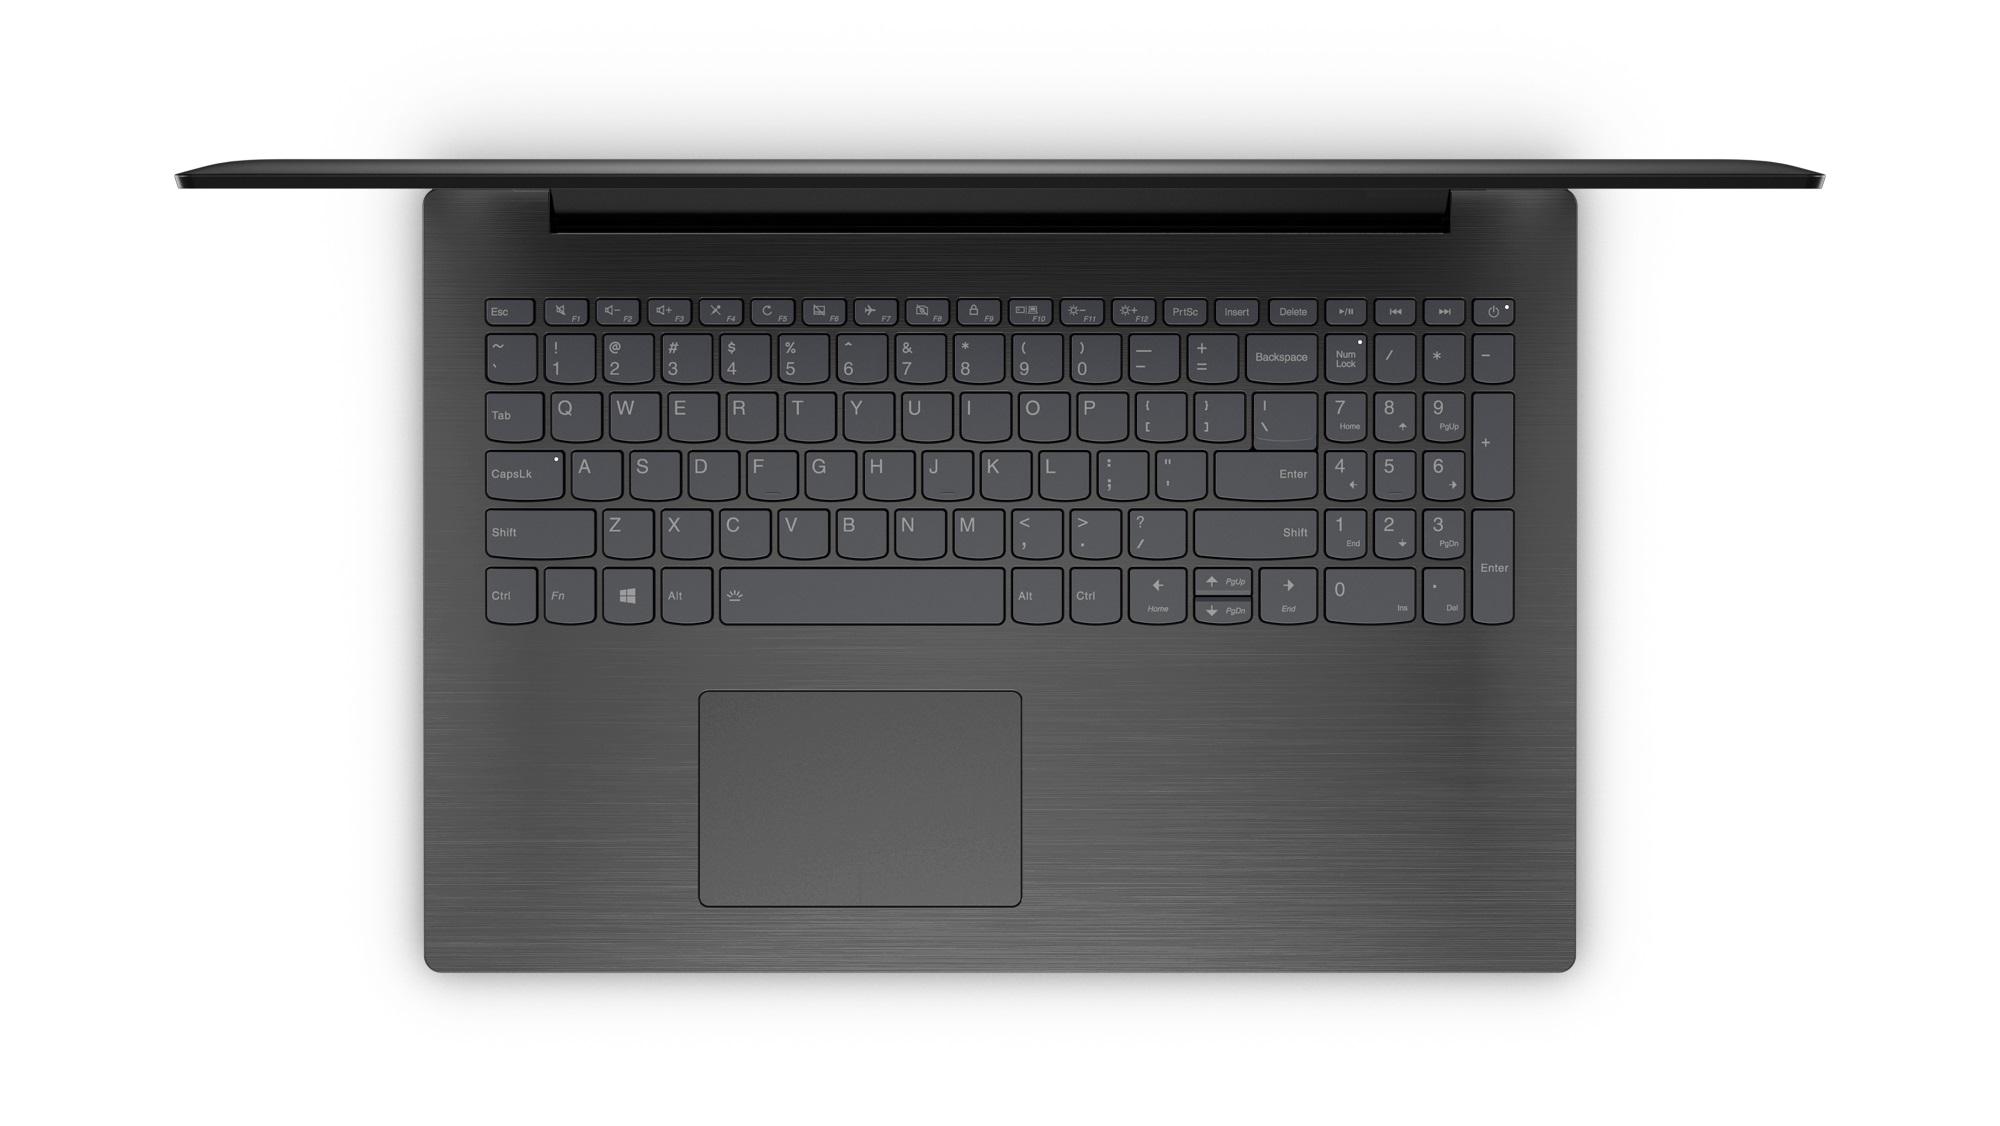 Фото  Ноутбук Lenovo ideapad 320-15IKB Onyx Black (80XL03WBRA)